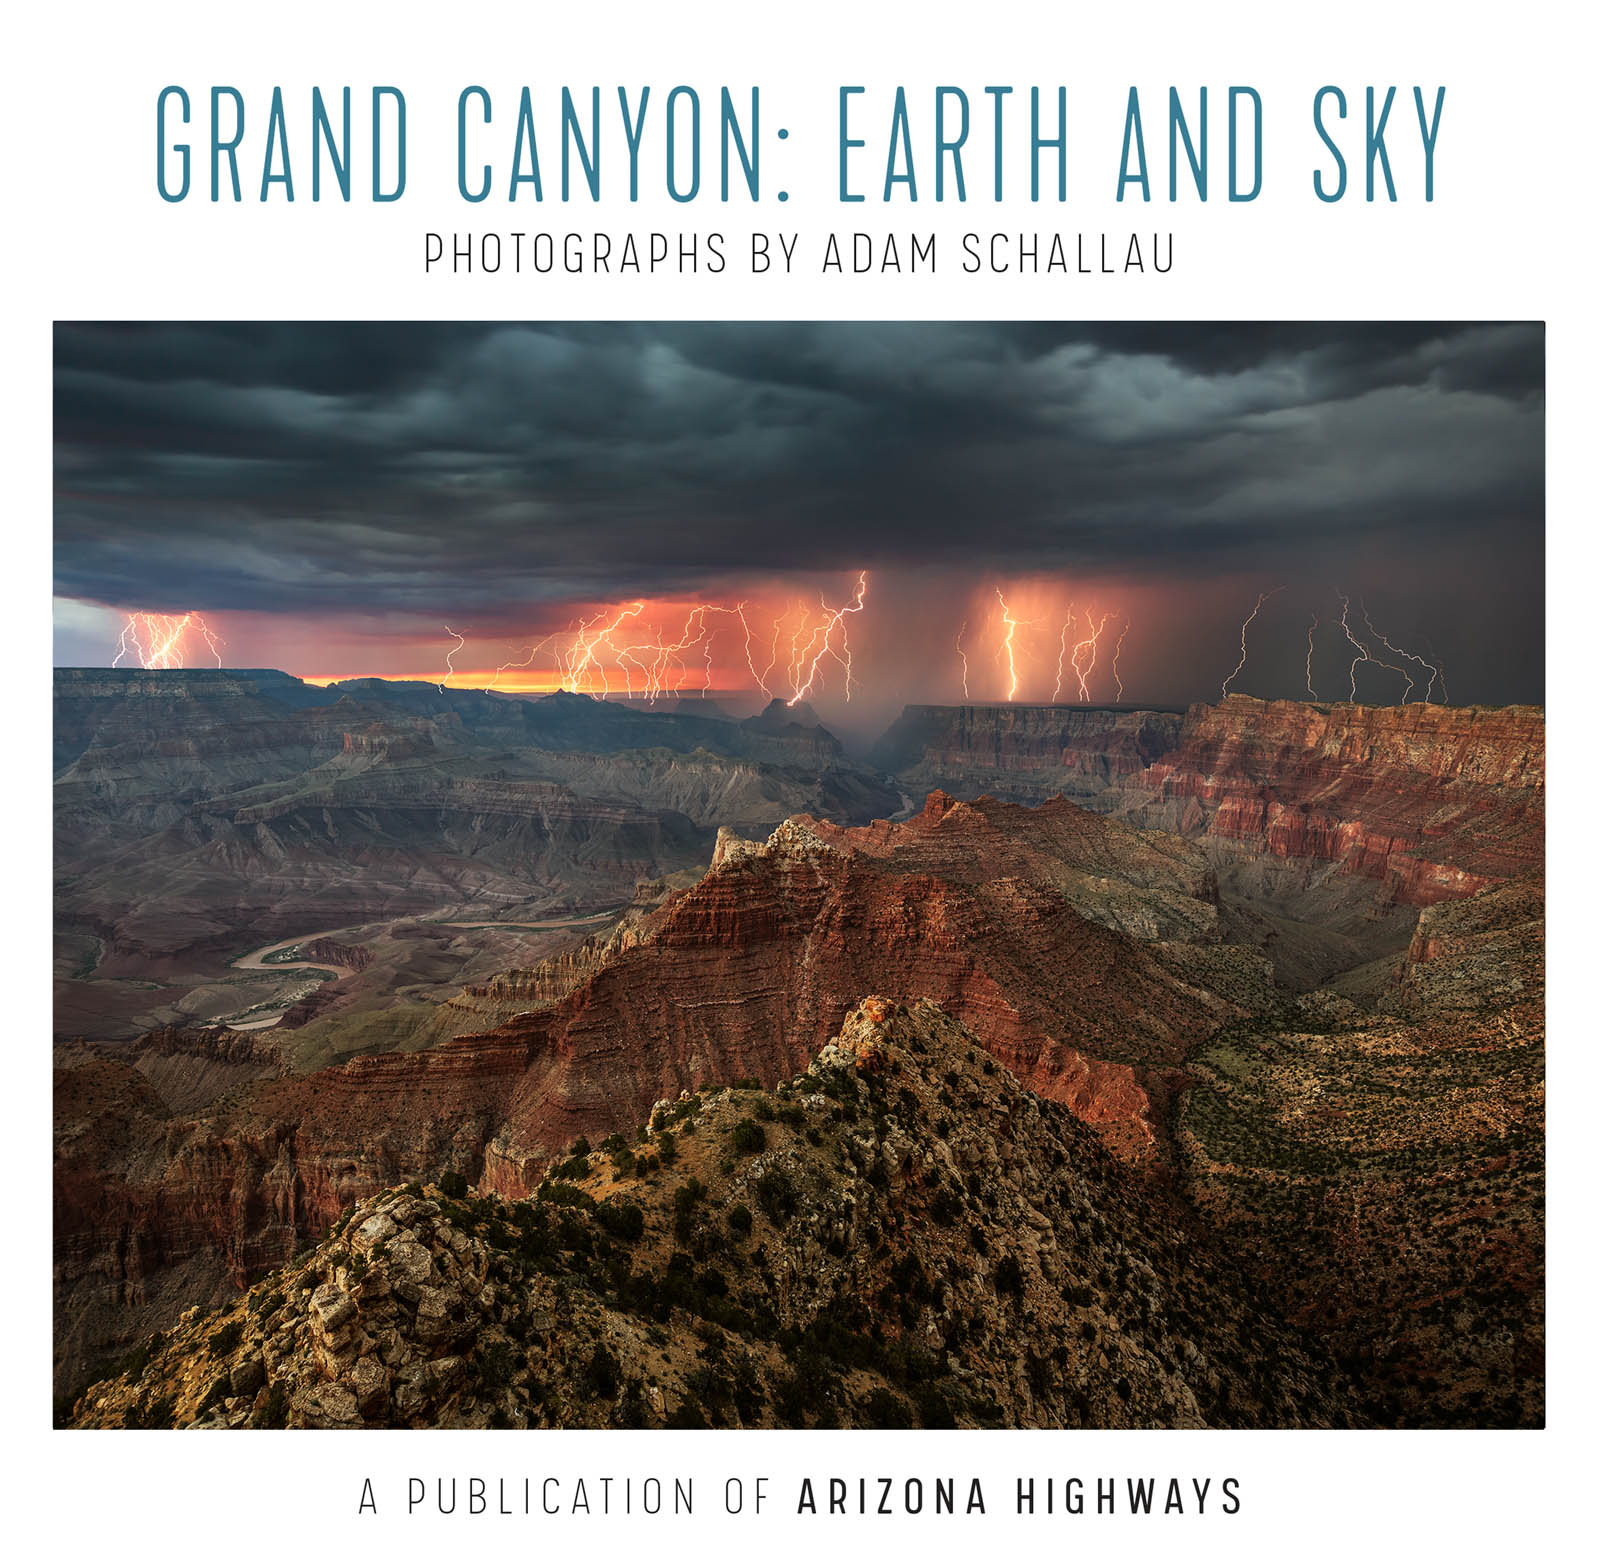 Arizona Highways, Grand Canyon, Book, Earth, Sky, Lightning, photo